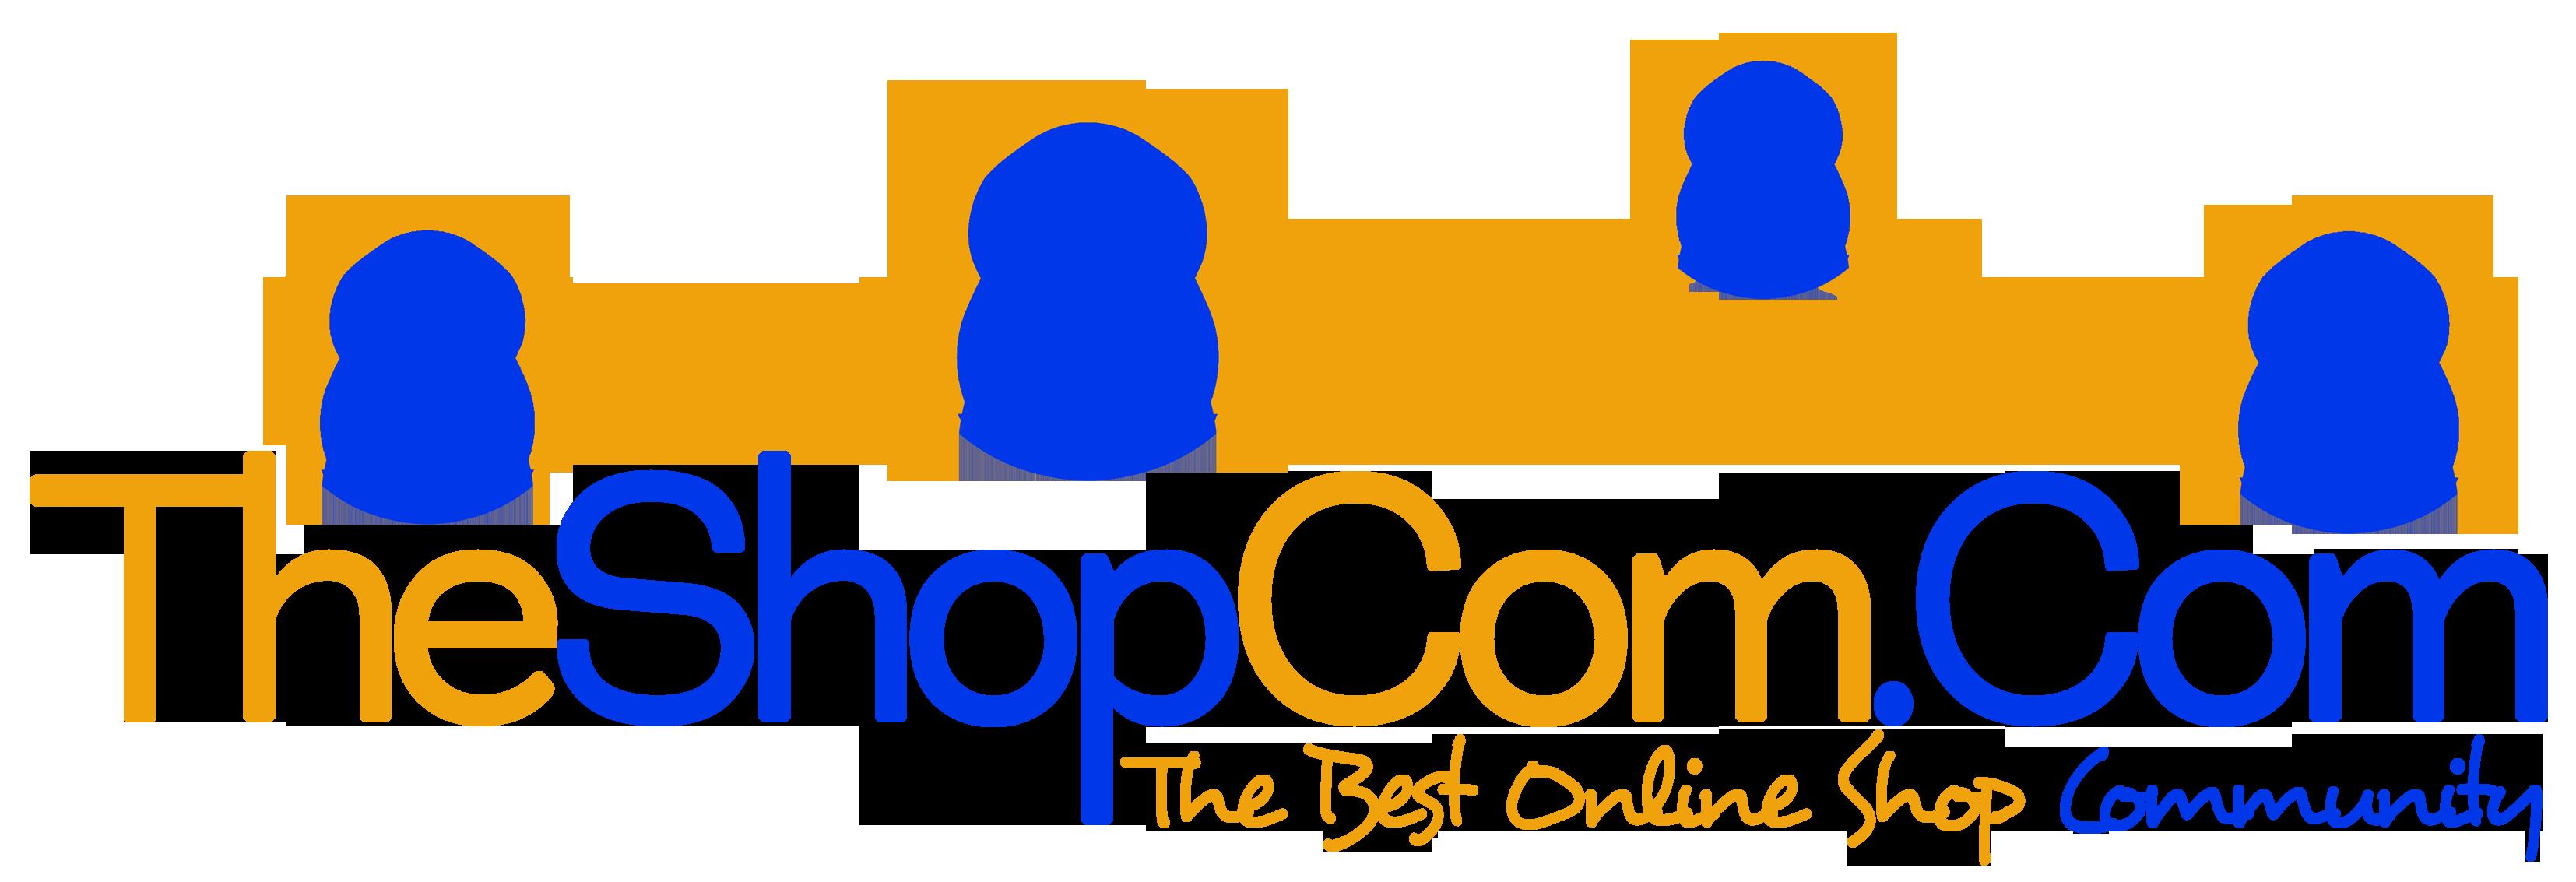 TheShopCom